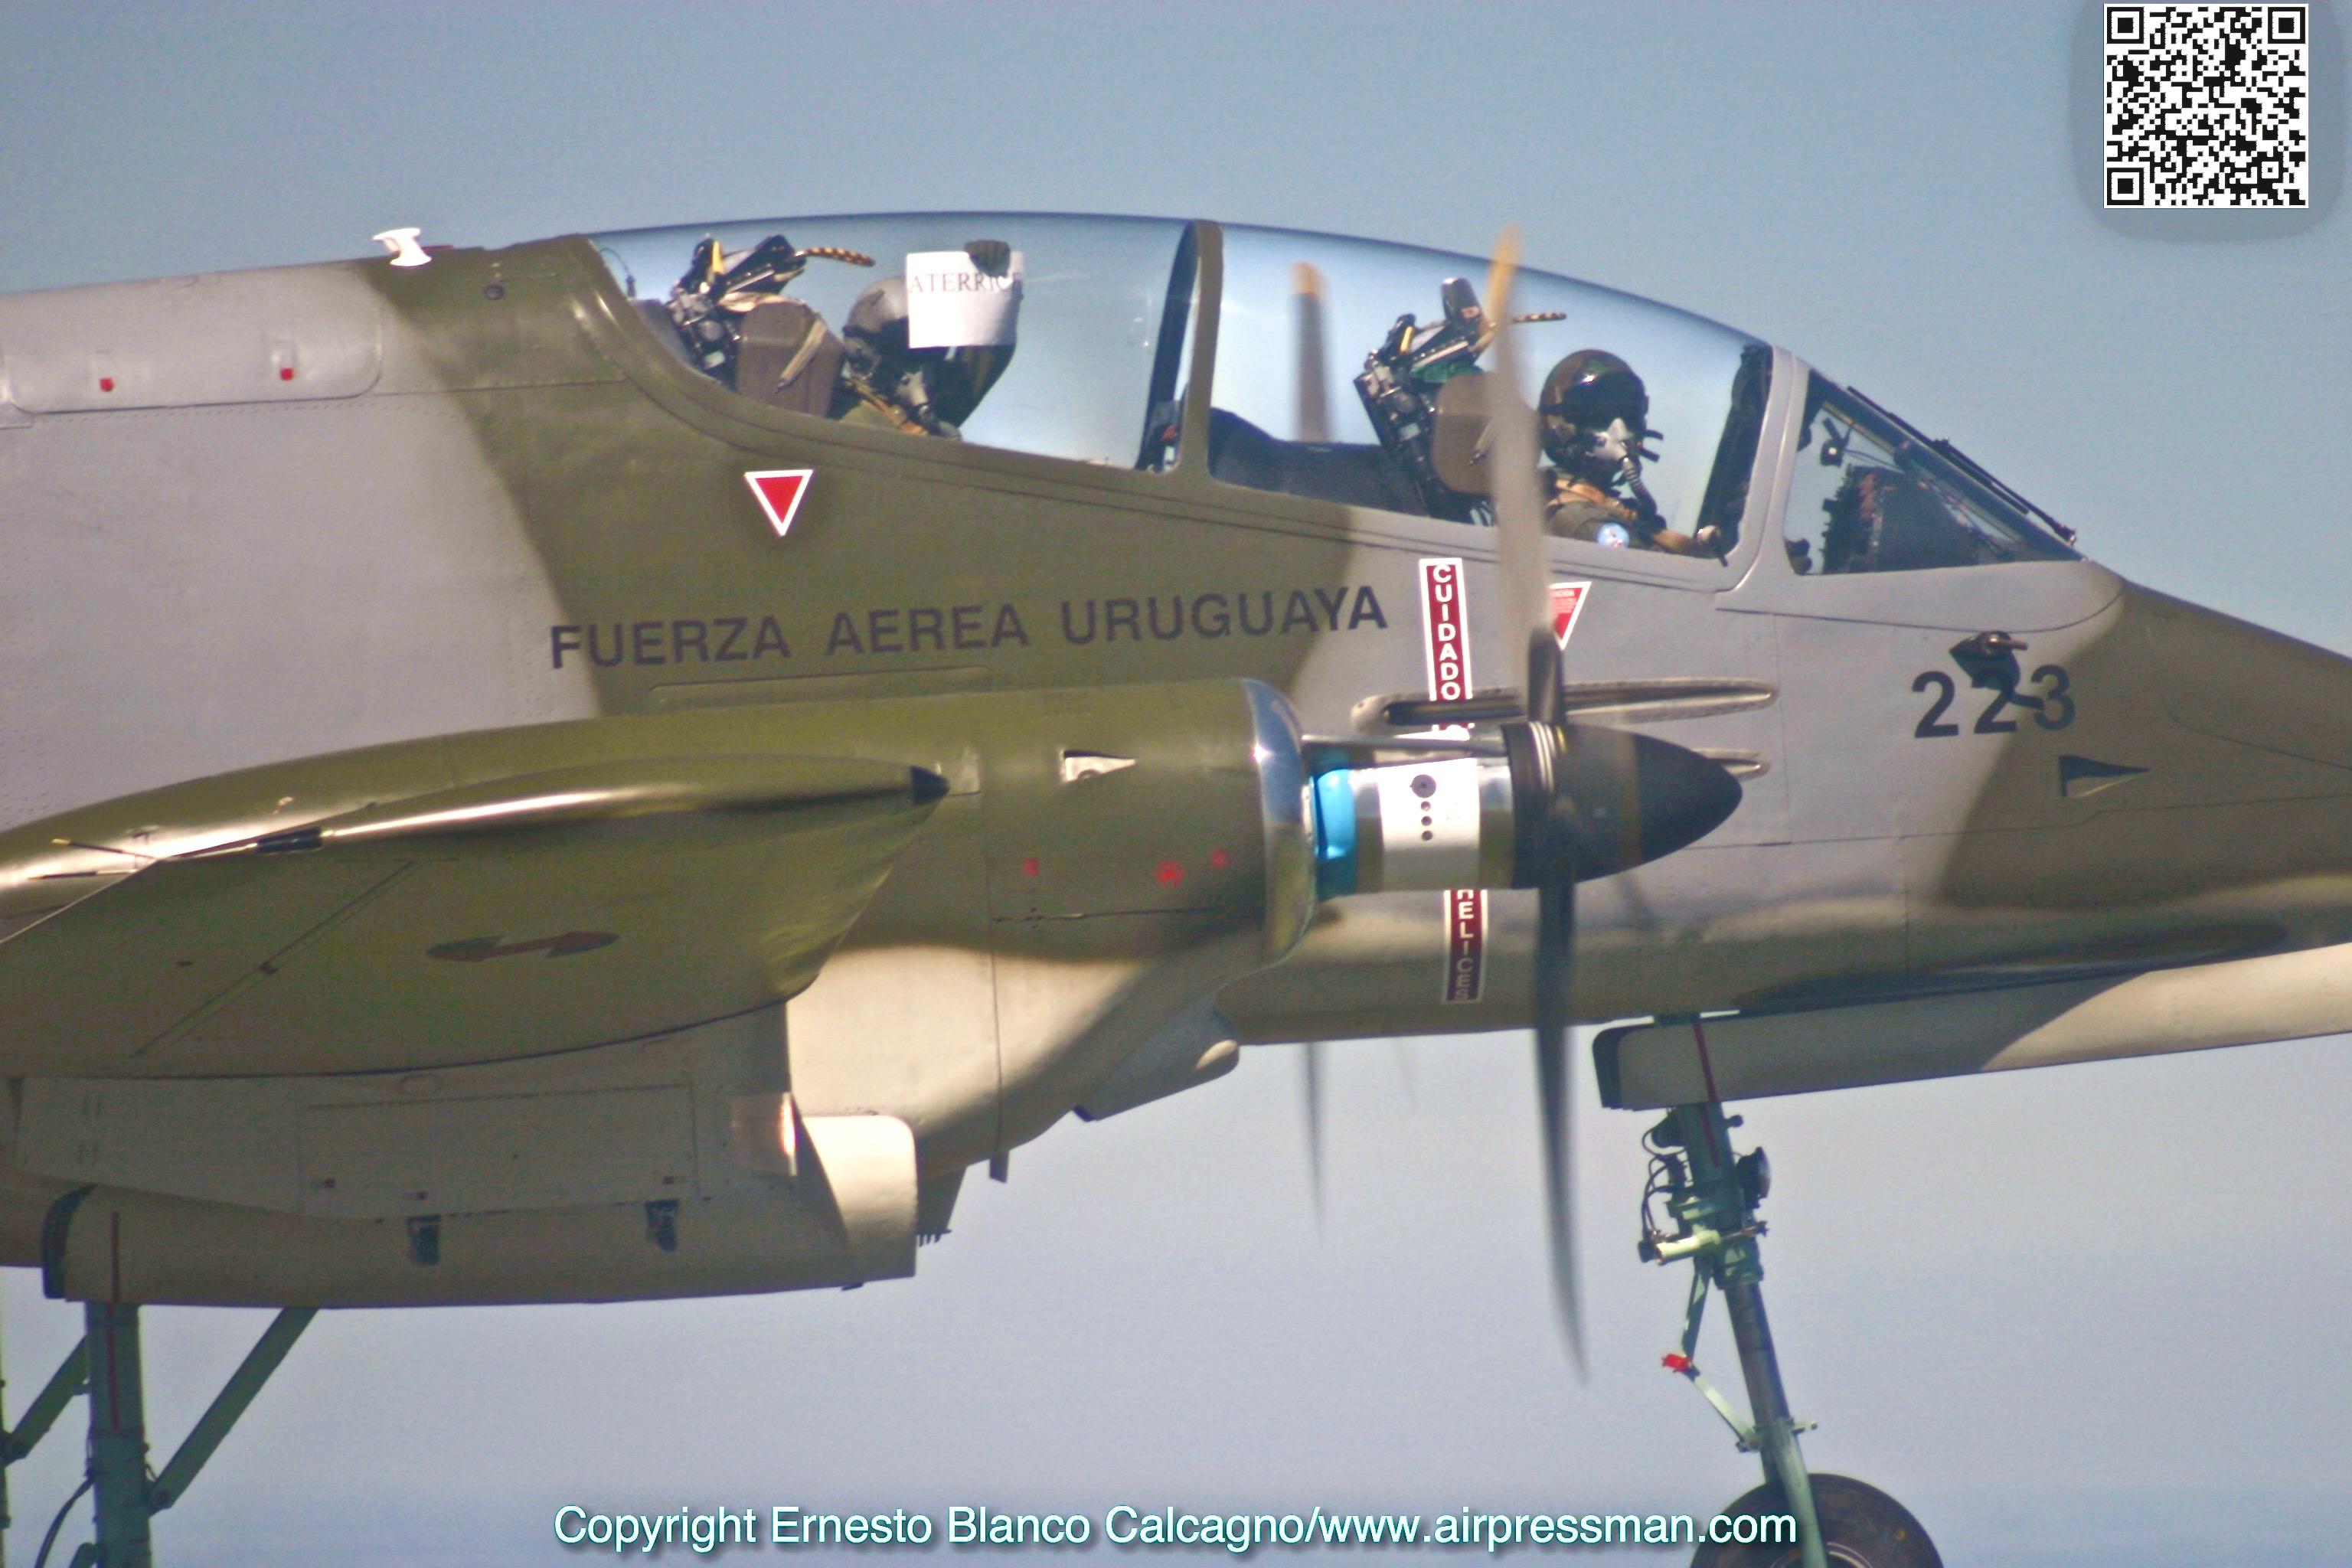 Pucará – Uruguayan Drugbuster - Airpressman